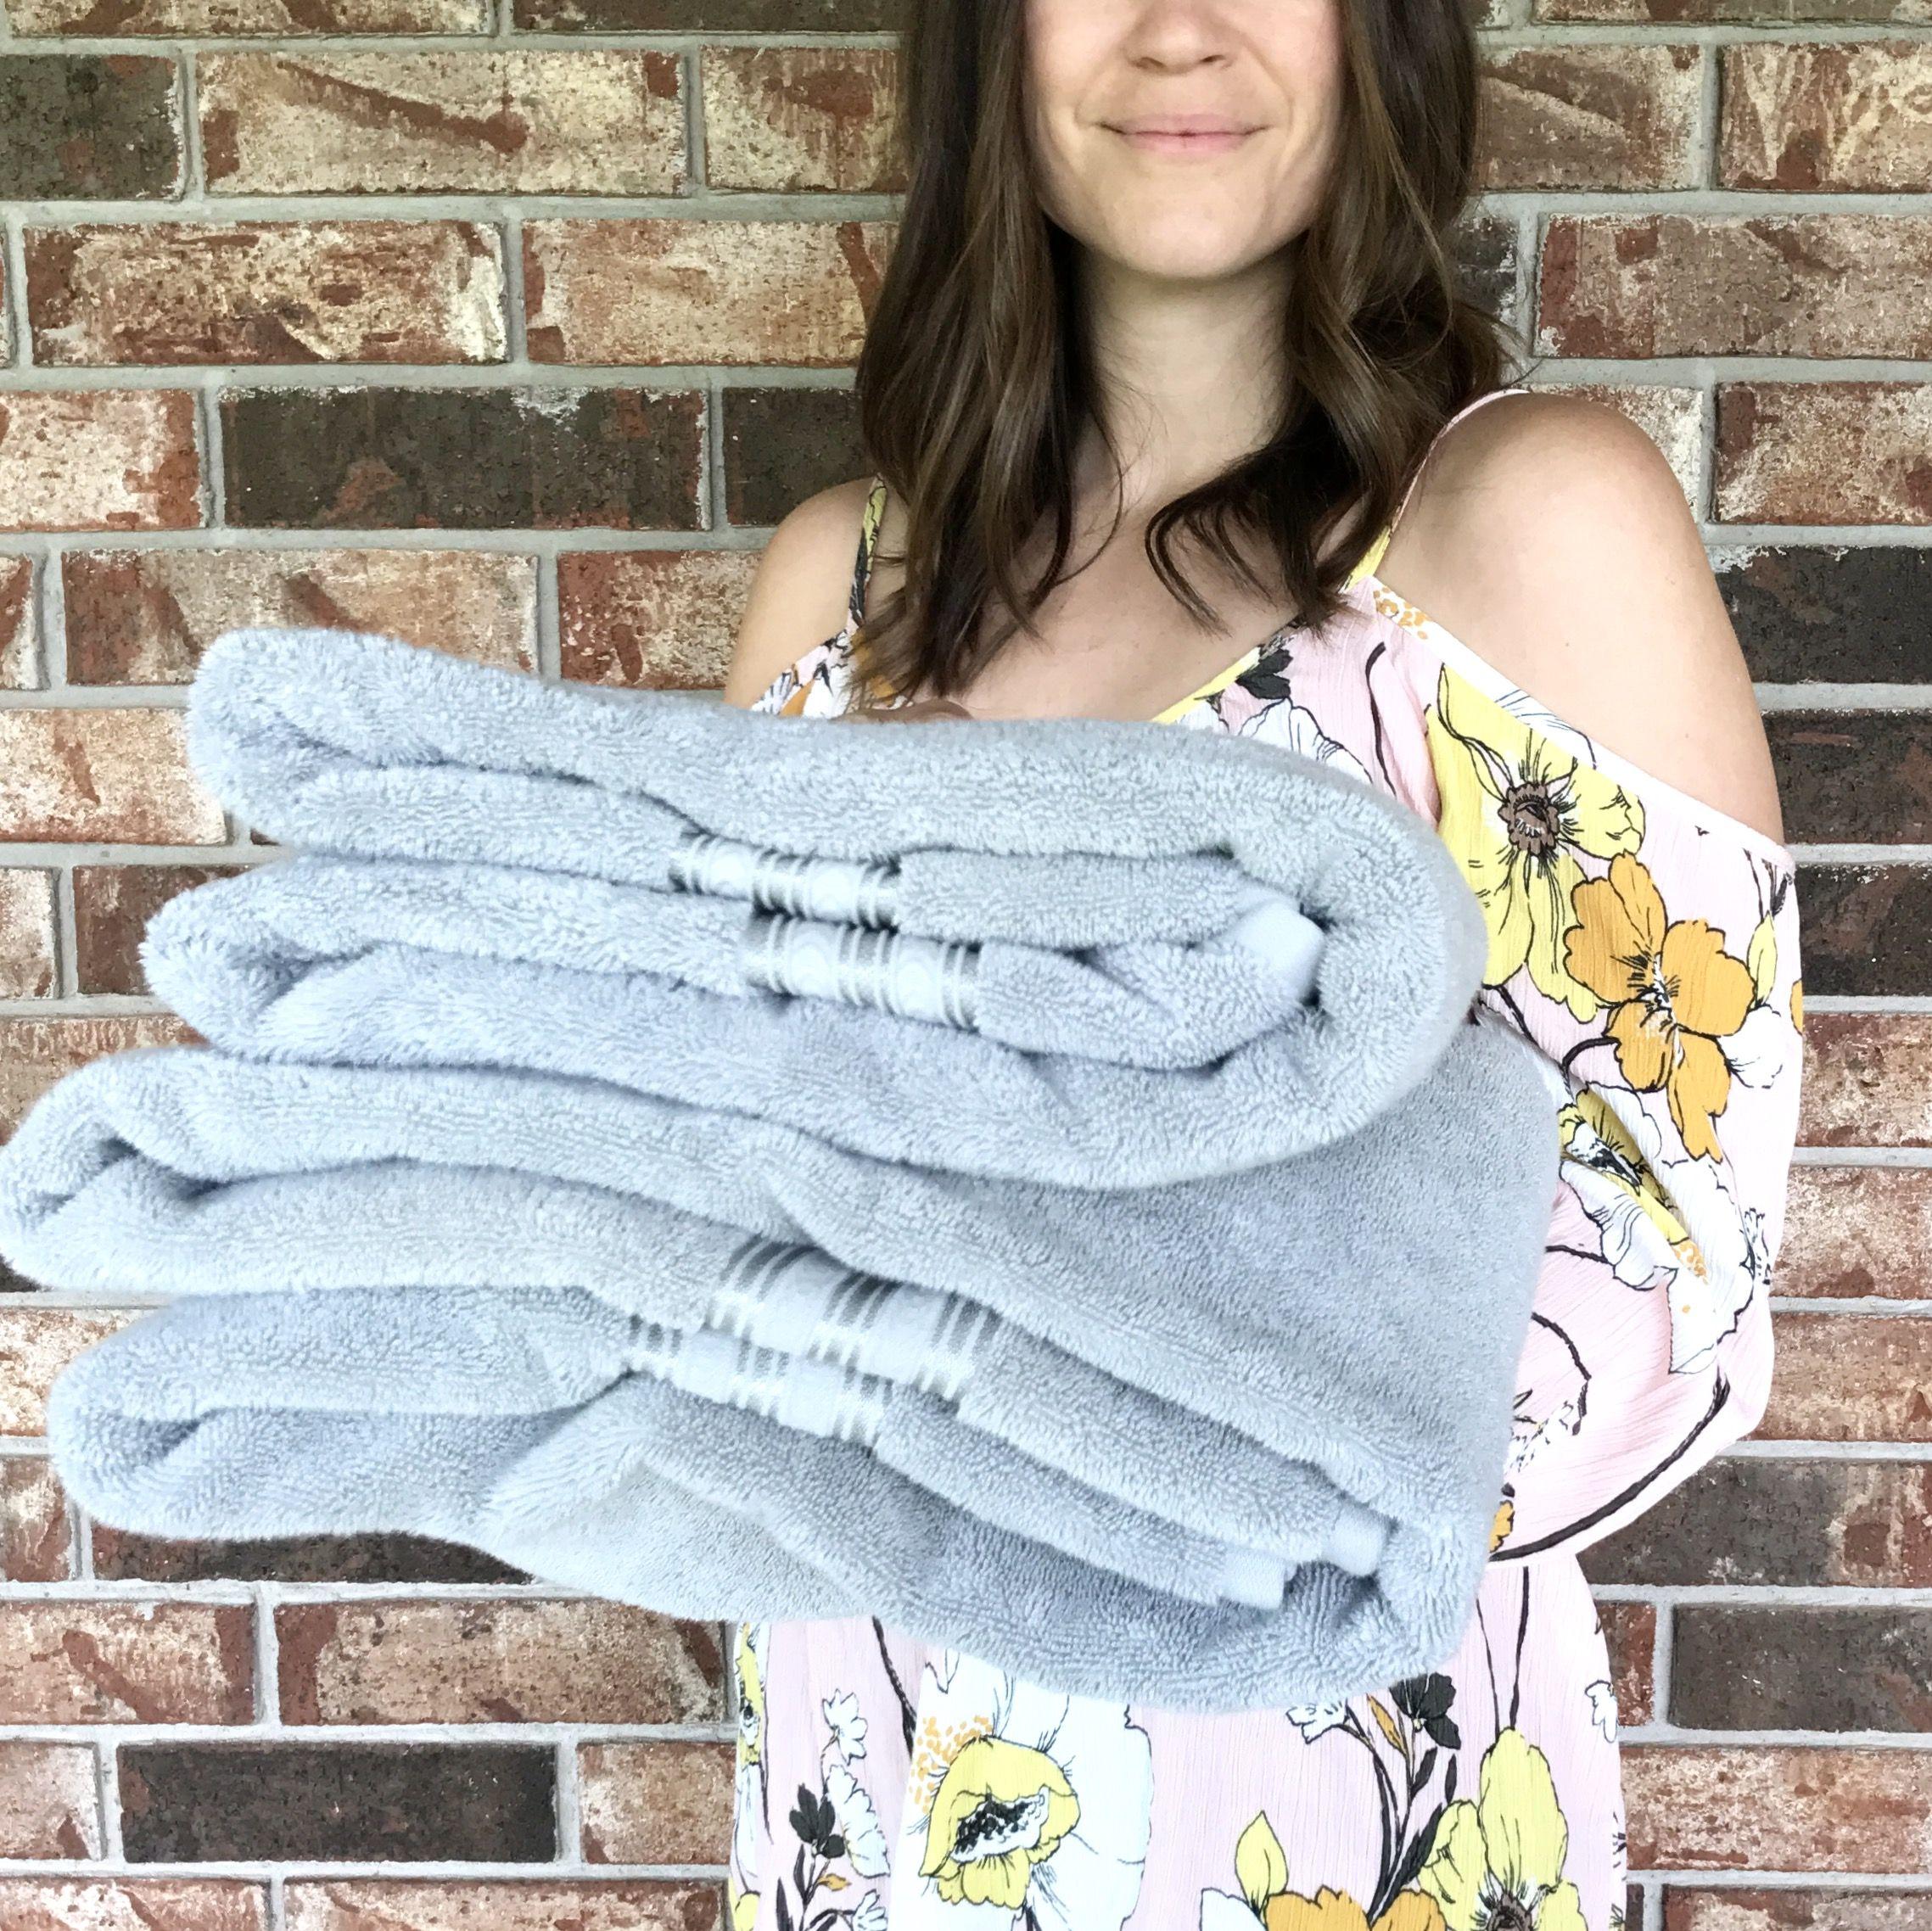 Thick Plush Towels Via WhoaWaitWalmart Boost Your Bathroom - Plush towels for small bathroom ideas